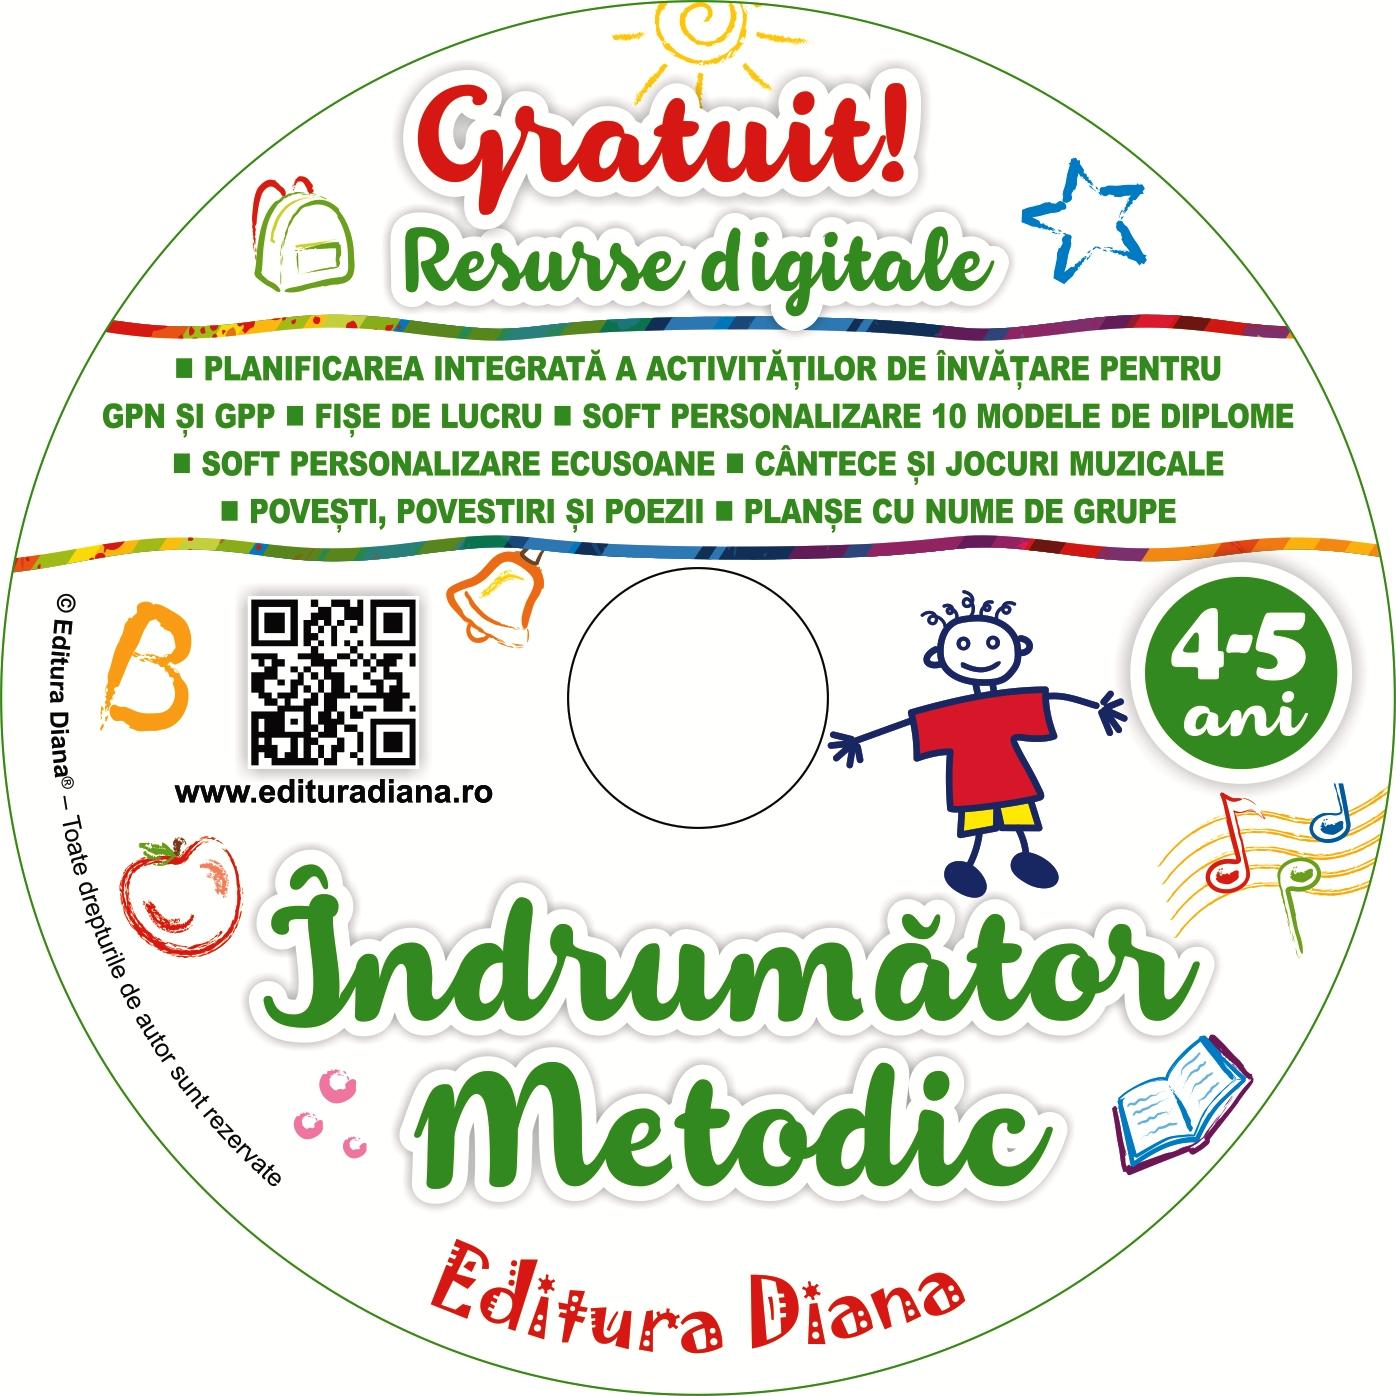 Îndrumător metodic 4-5 ani imagine edituradiana.ro